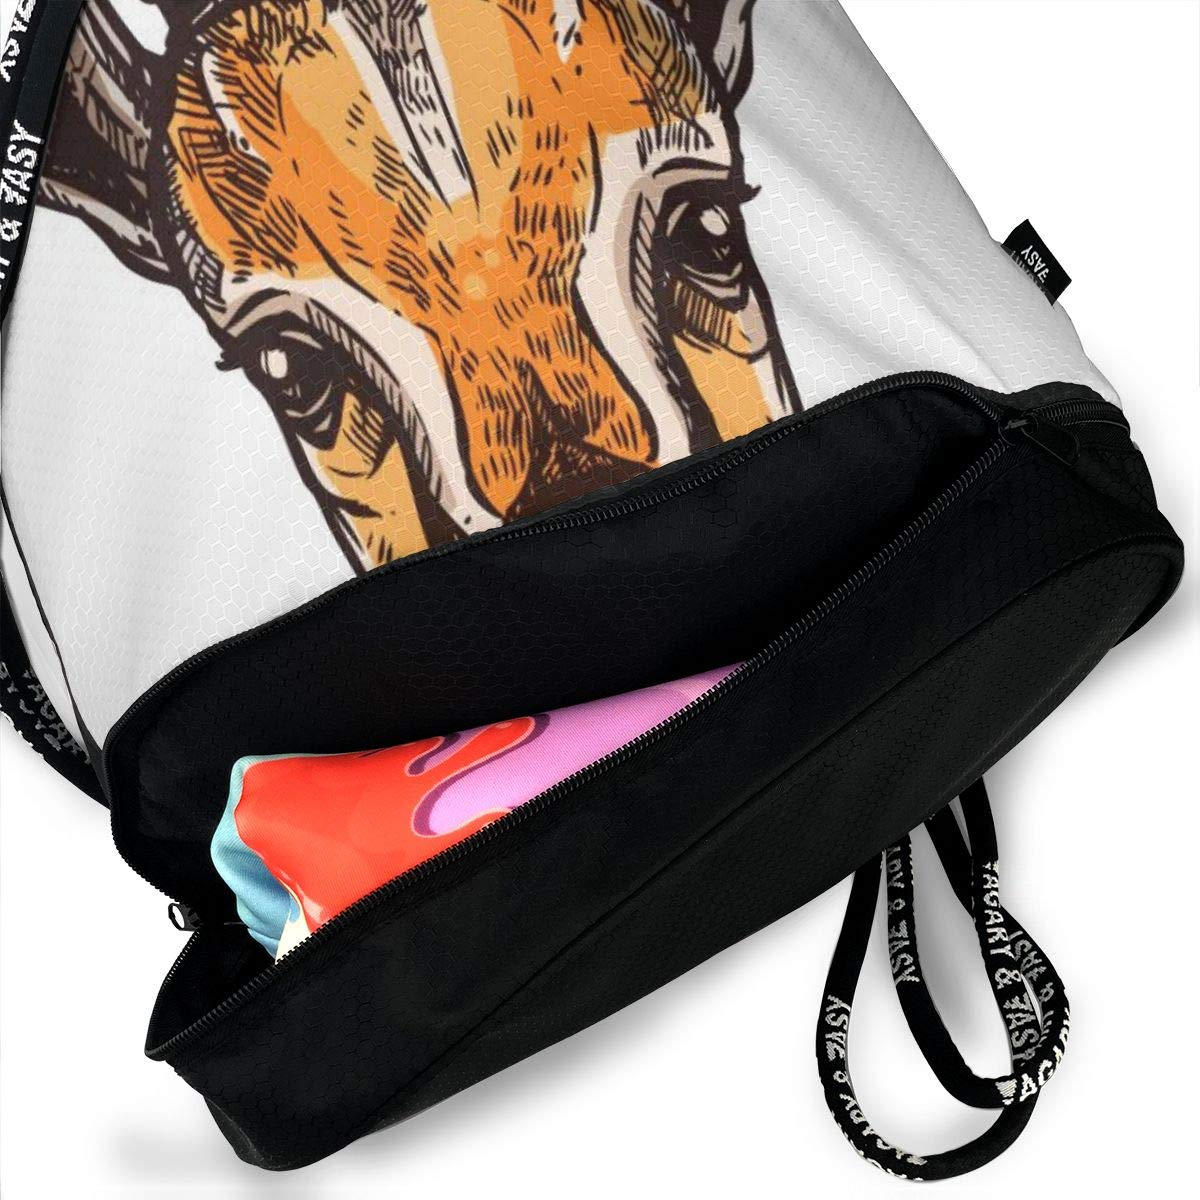 African Antelopes Cinch Backpack Sackpack Tote Sack Lightweight Waterproof Large Storage Drawstring Bag For Men /& Women